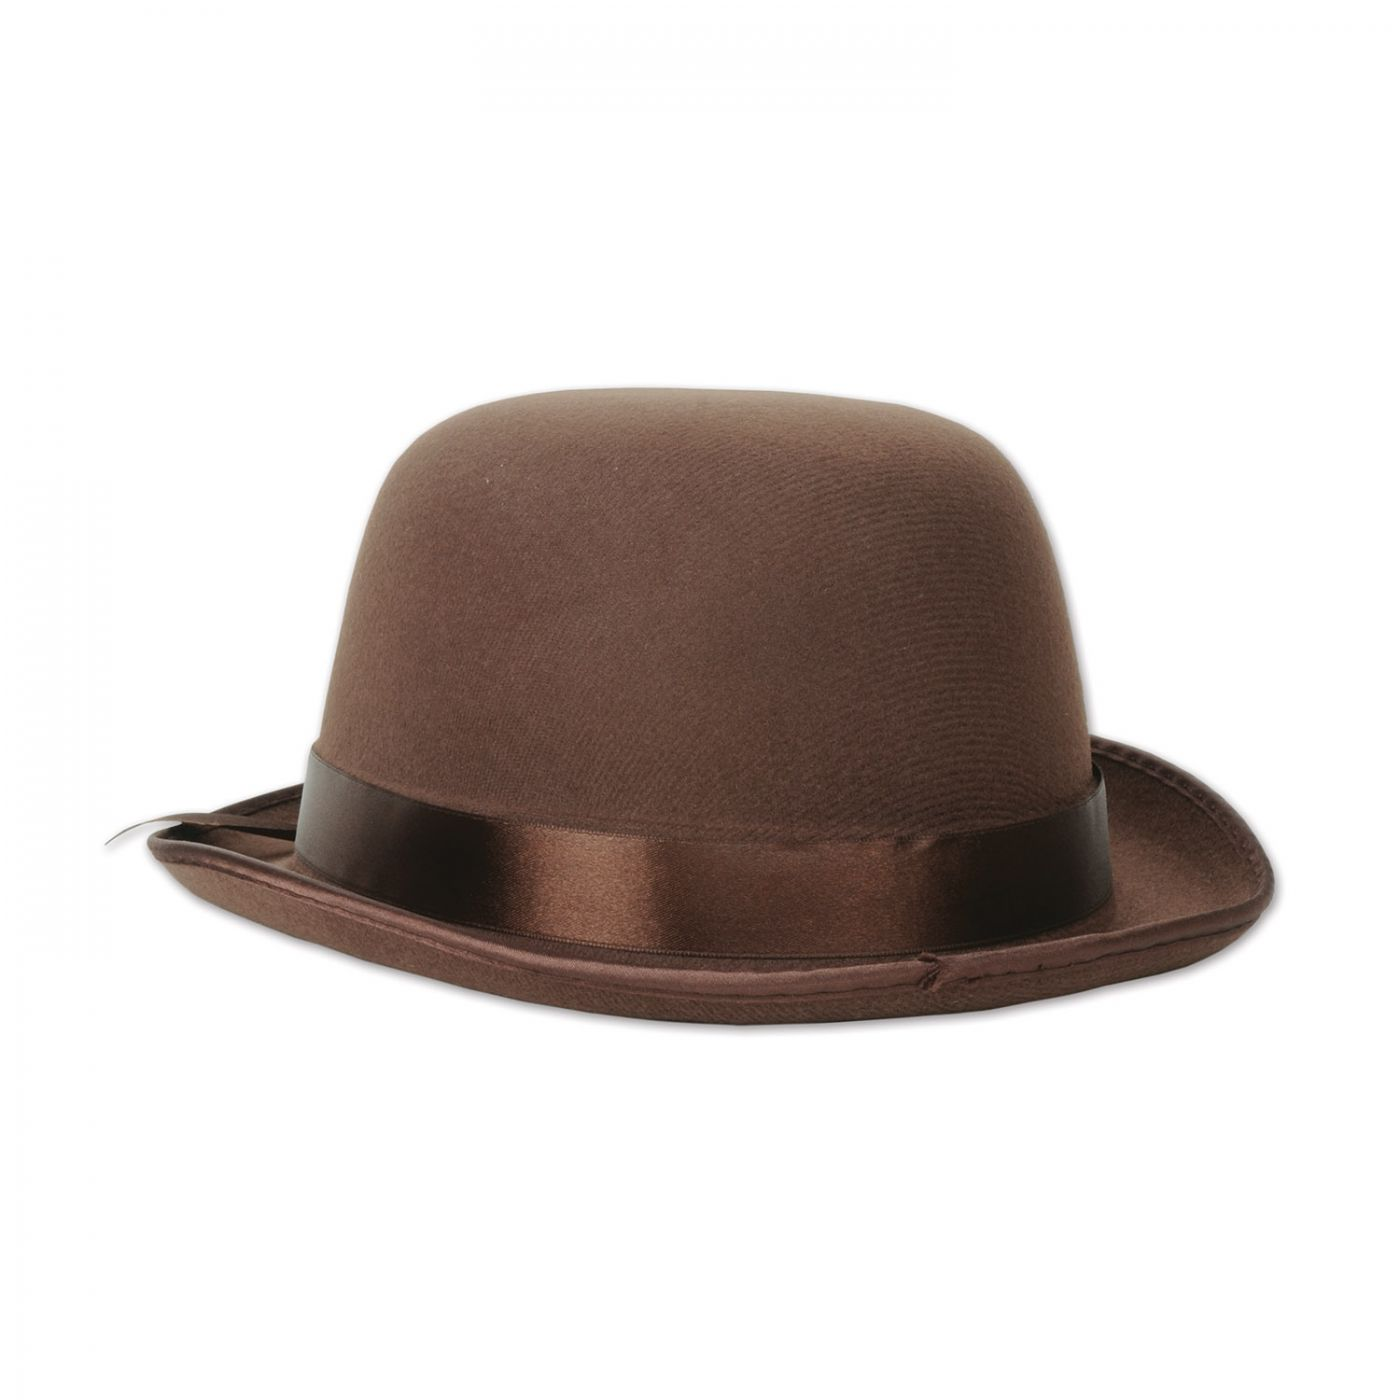 Image of Bowler Hat